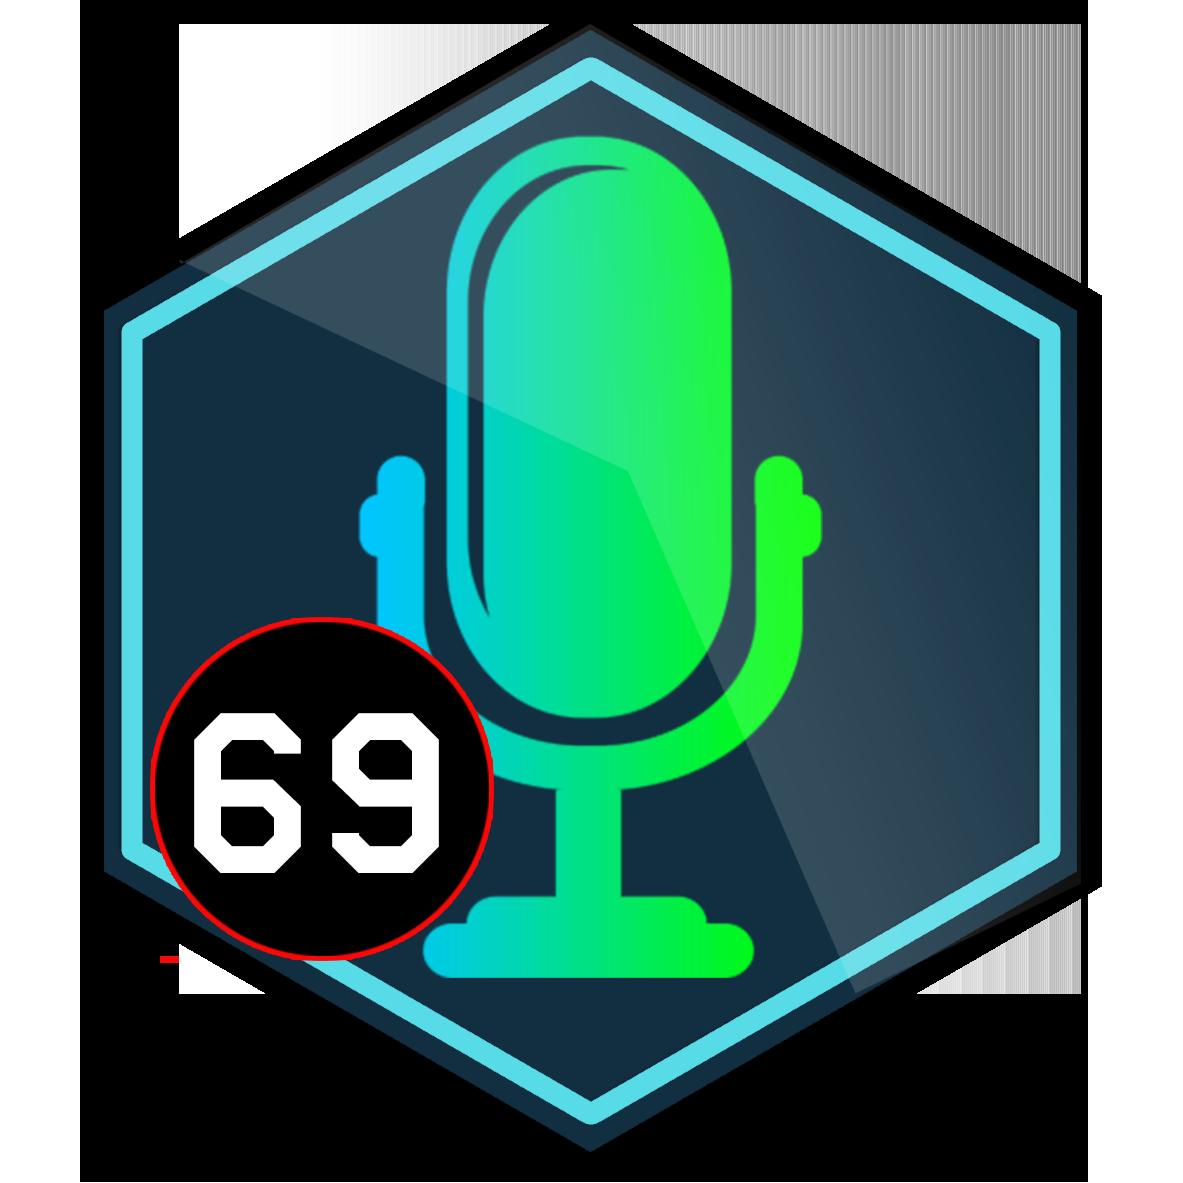 Episode 69 Badge